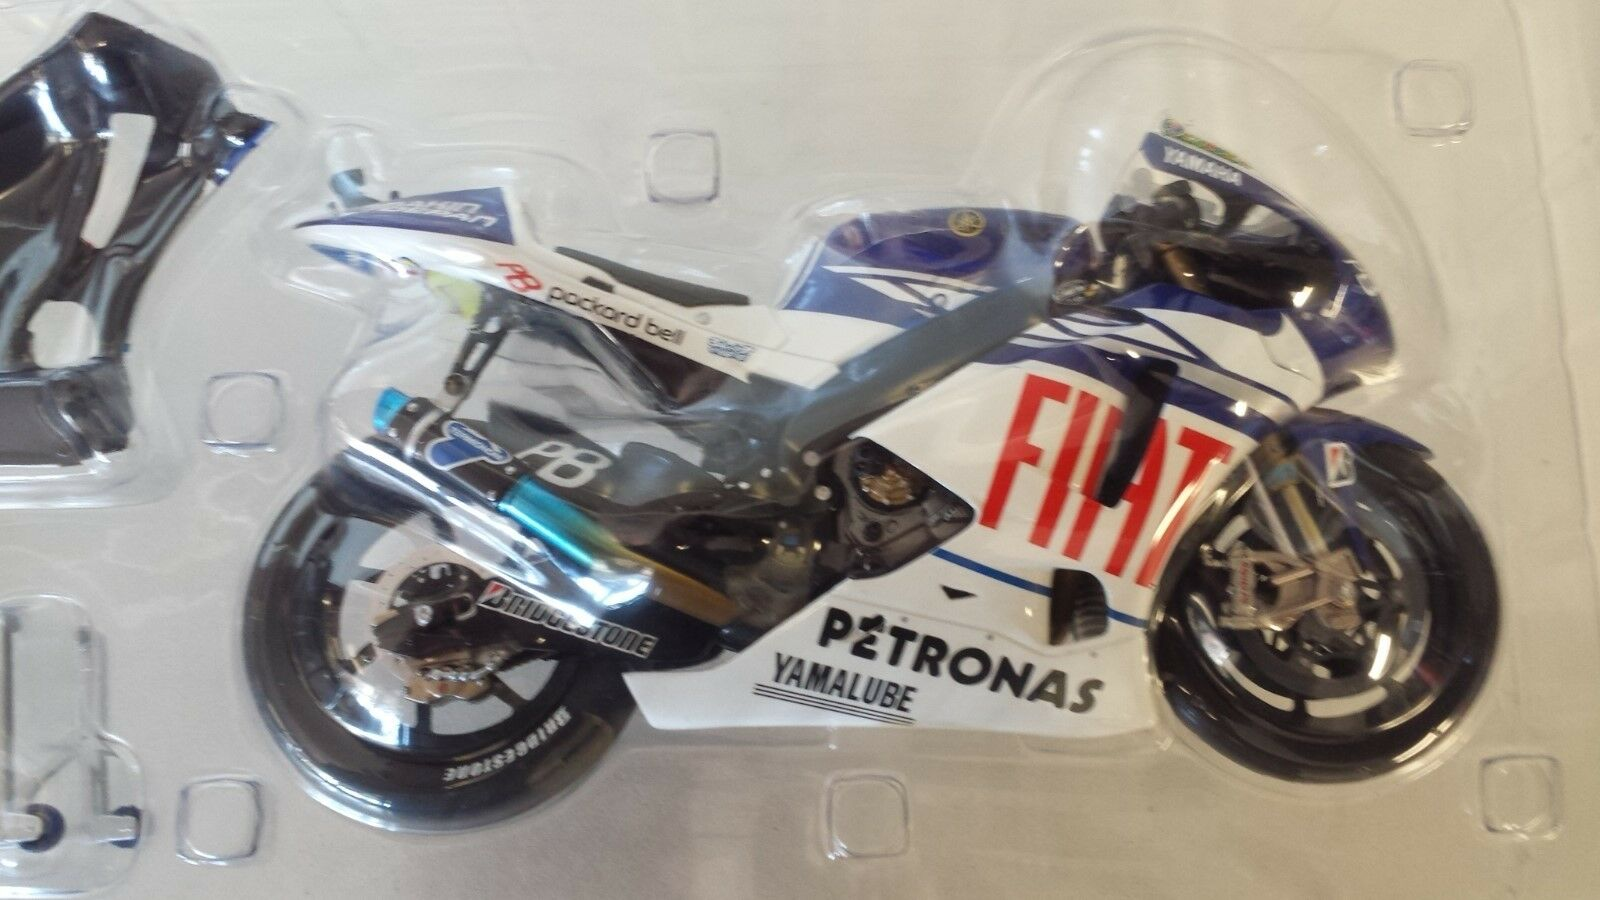 Valentino Rossi. Yamaha YZR-M1. MotoGP 2010.  Minichamps 1 12